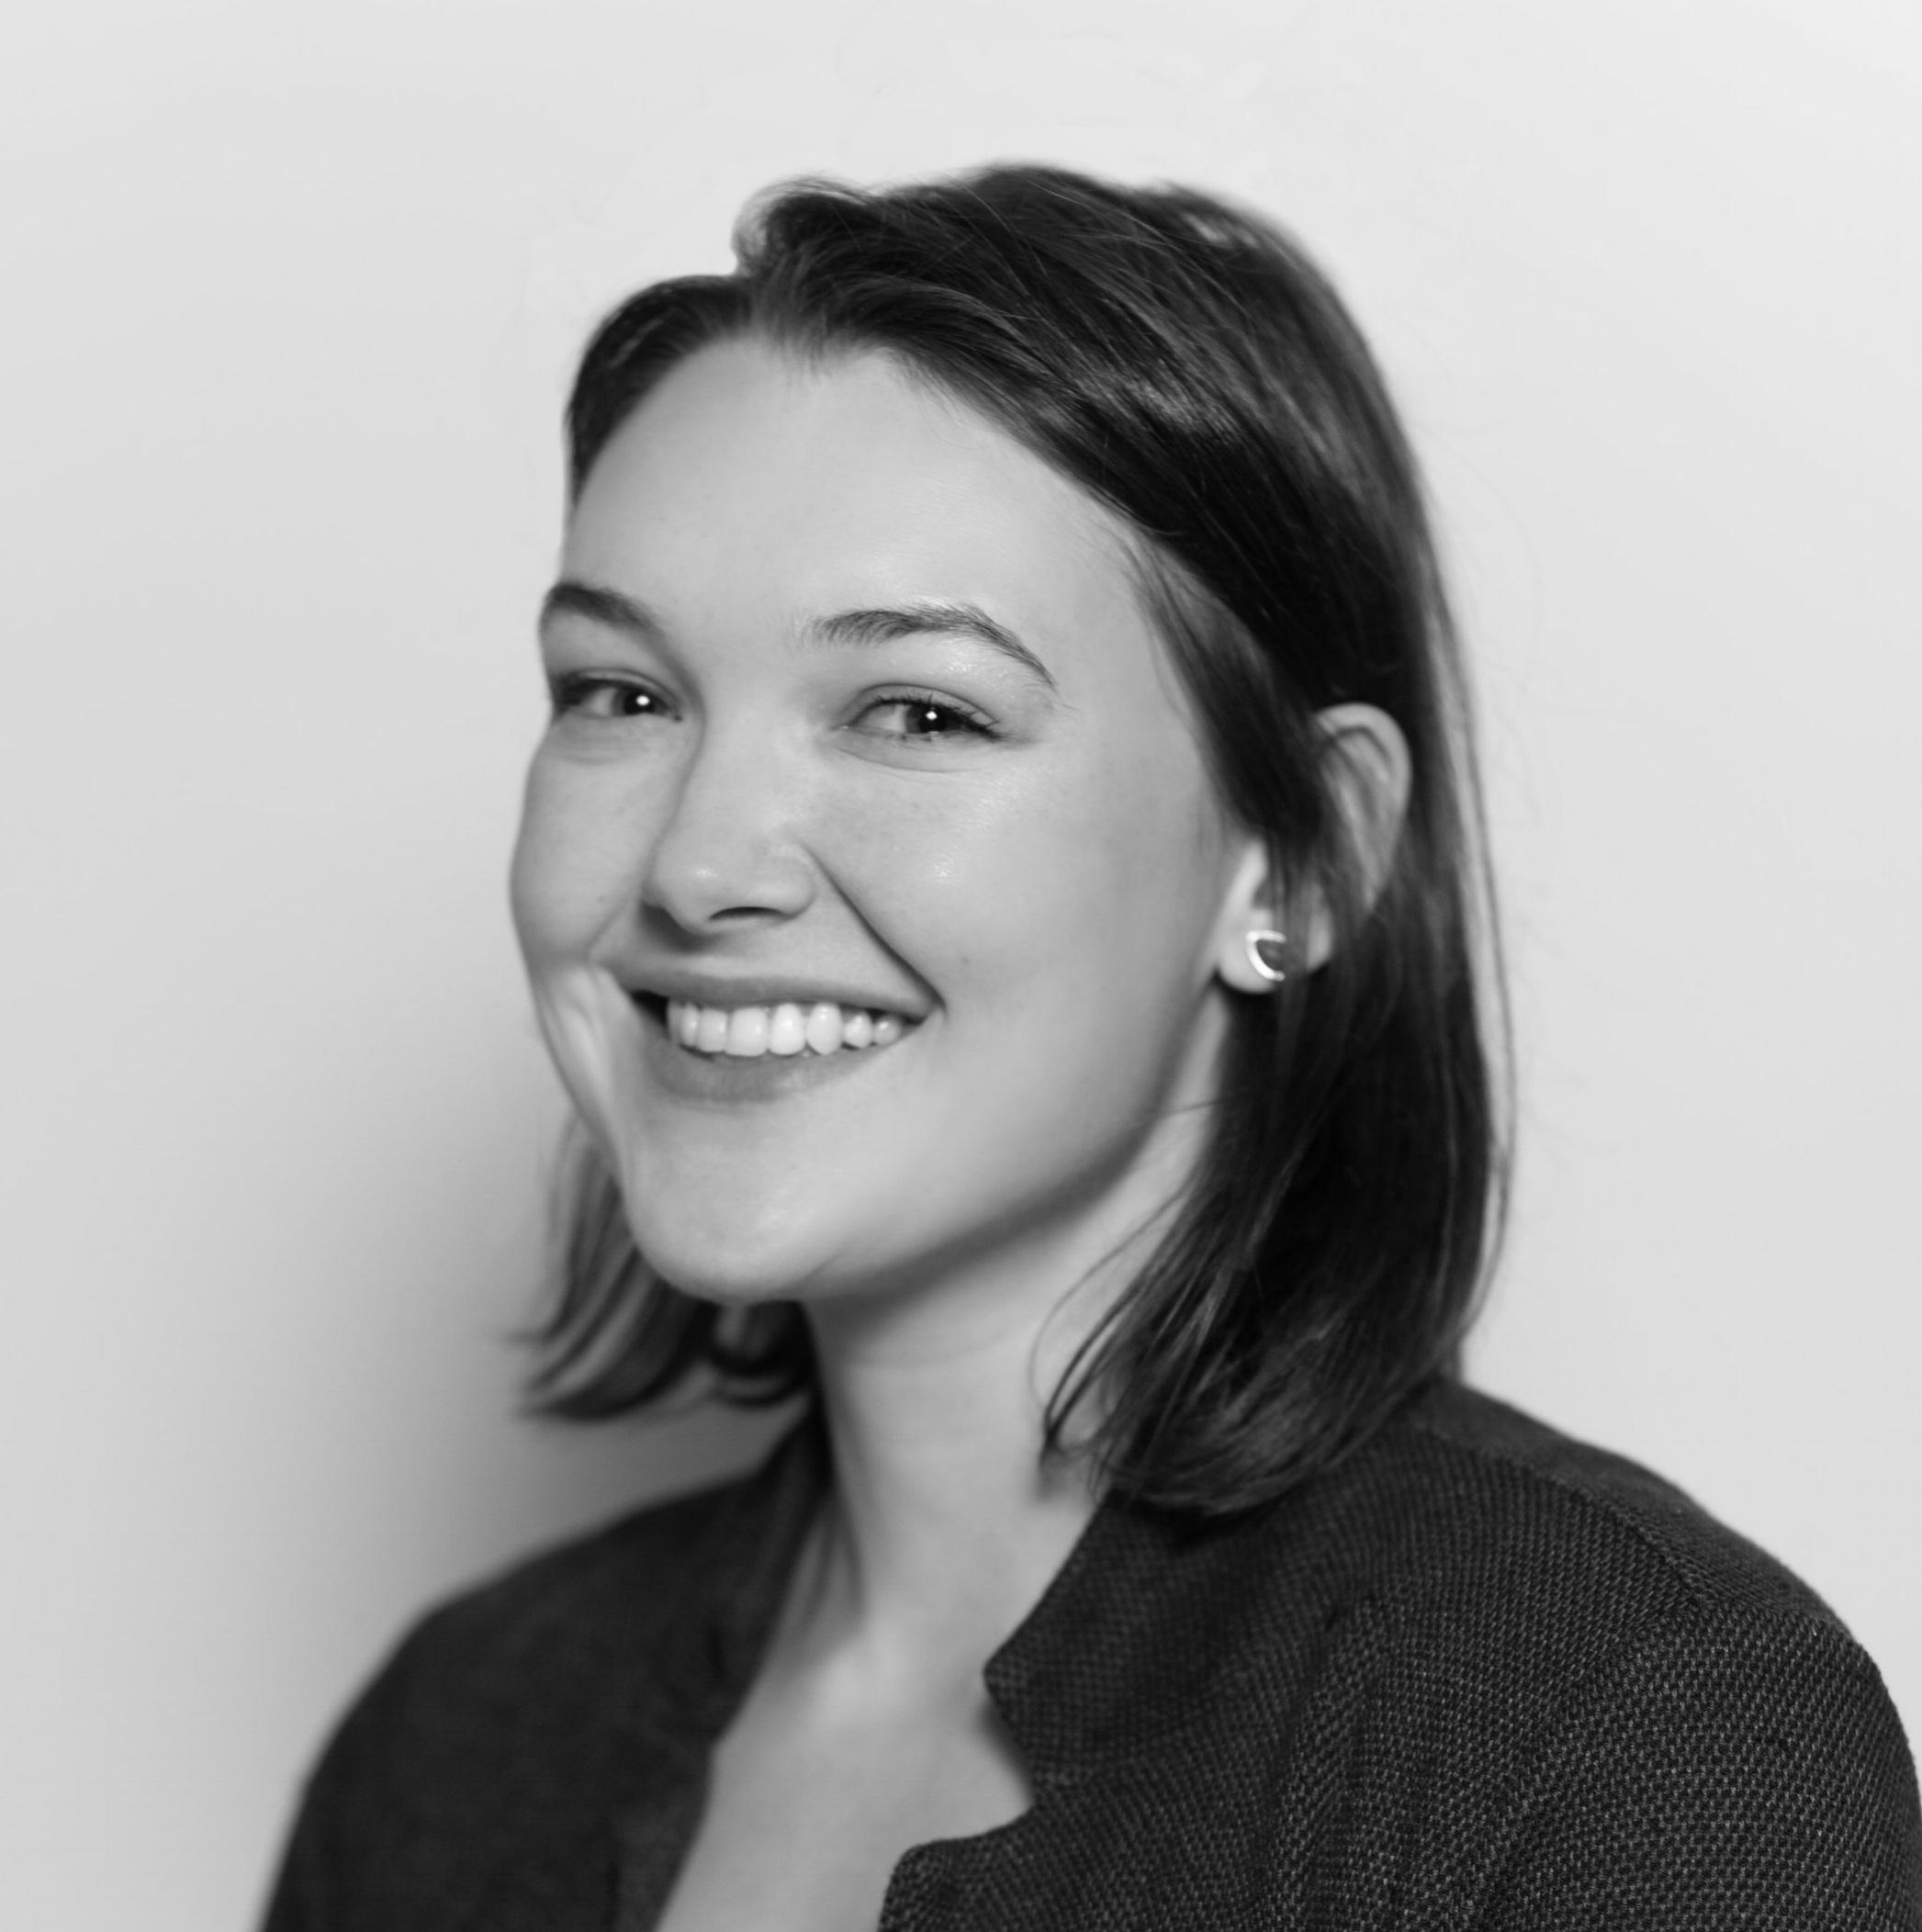 Elise O'Malley, Communications Coordinator